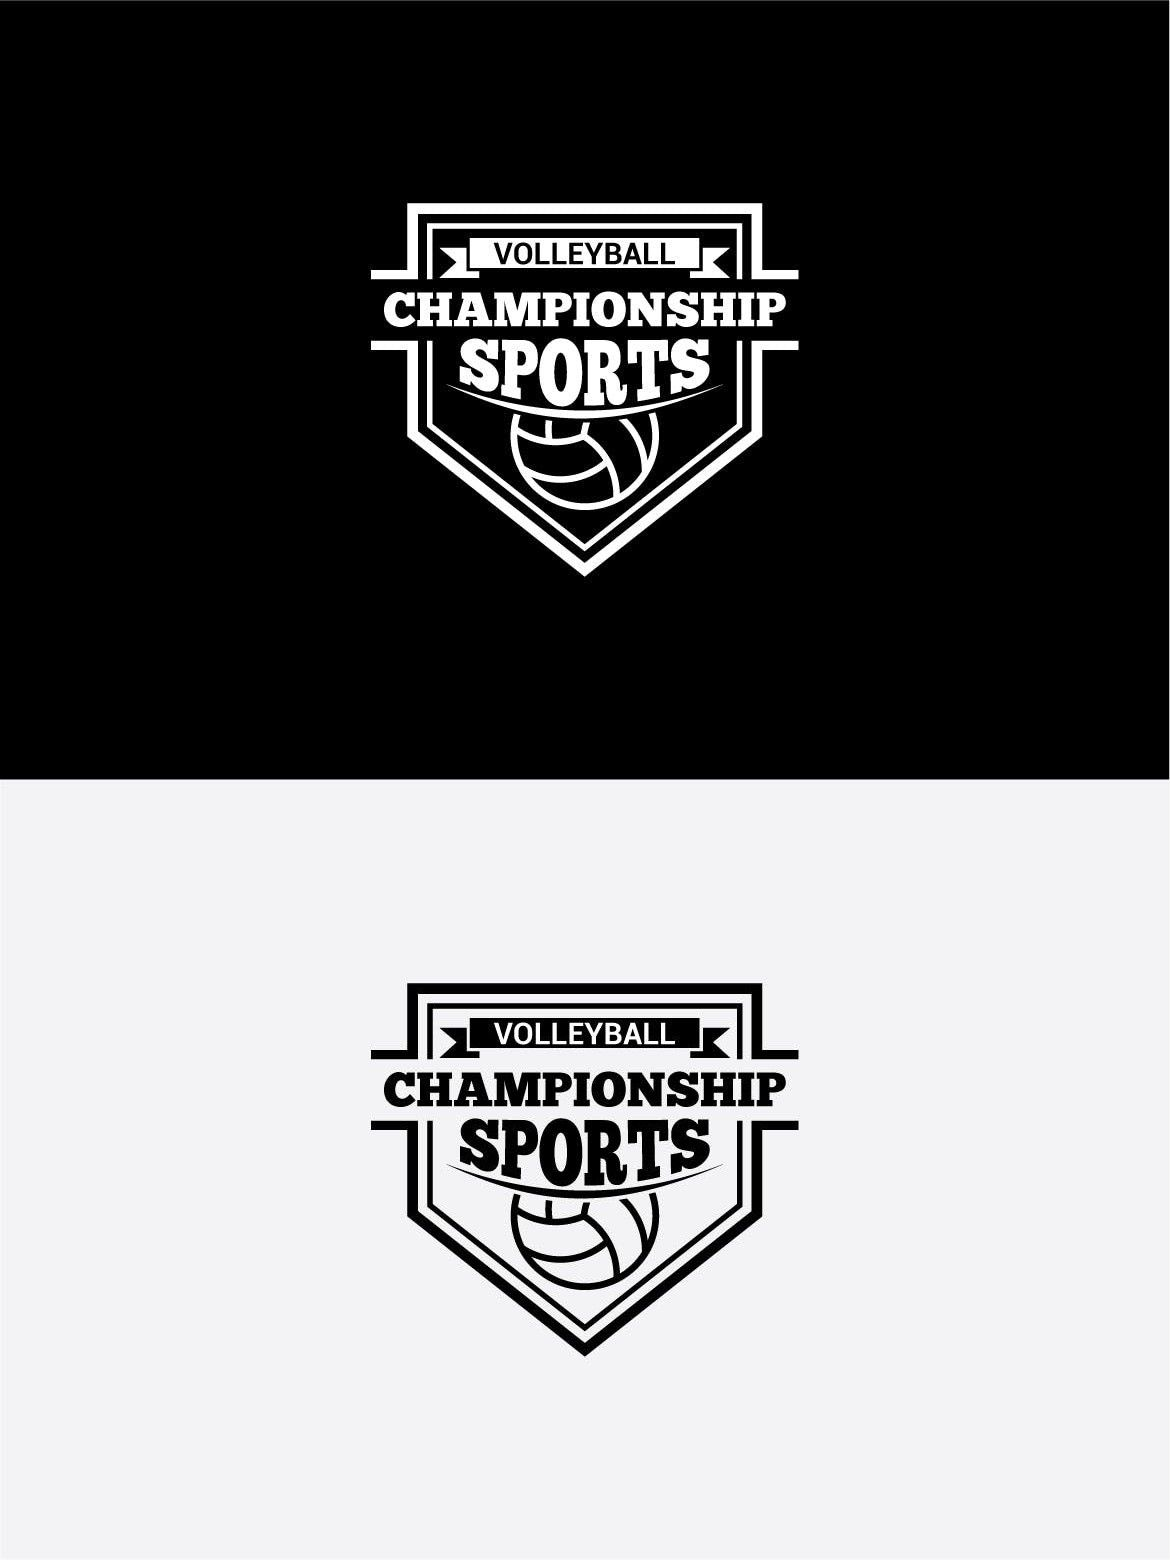 Volleyball Logo2 Volleyball Sport Volleyball Video Template